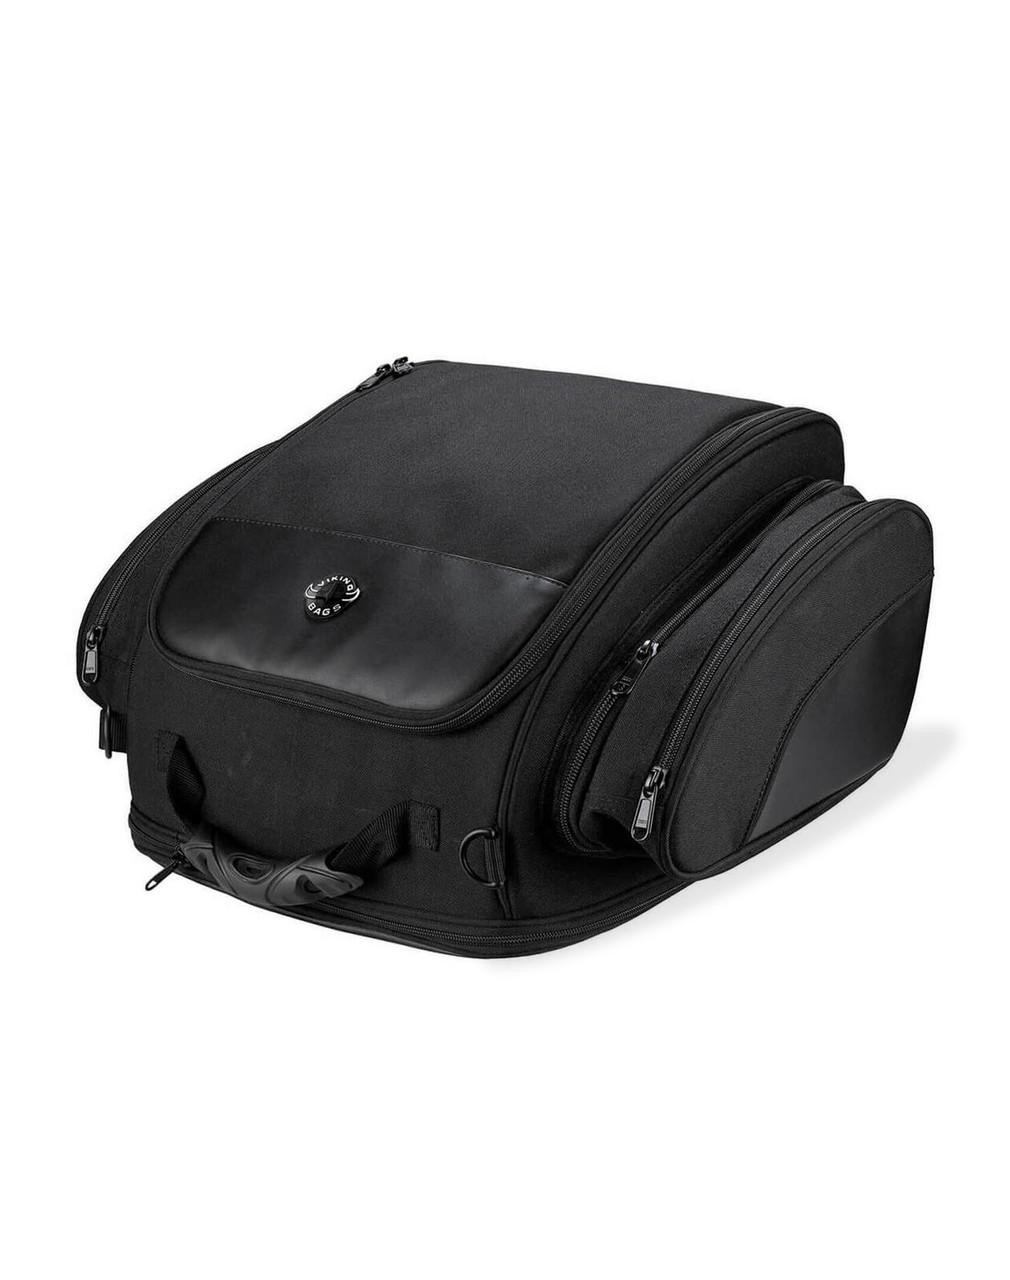 VikingBags Large Motorcycle Tail Bag For Harley Davidson Main bag  View